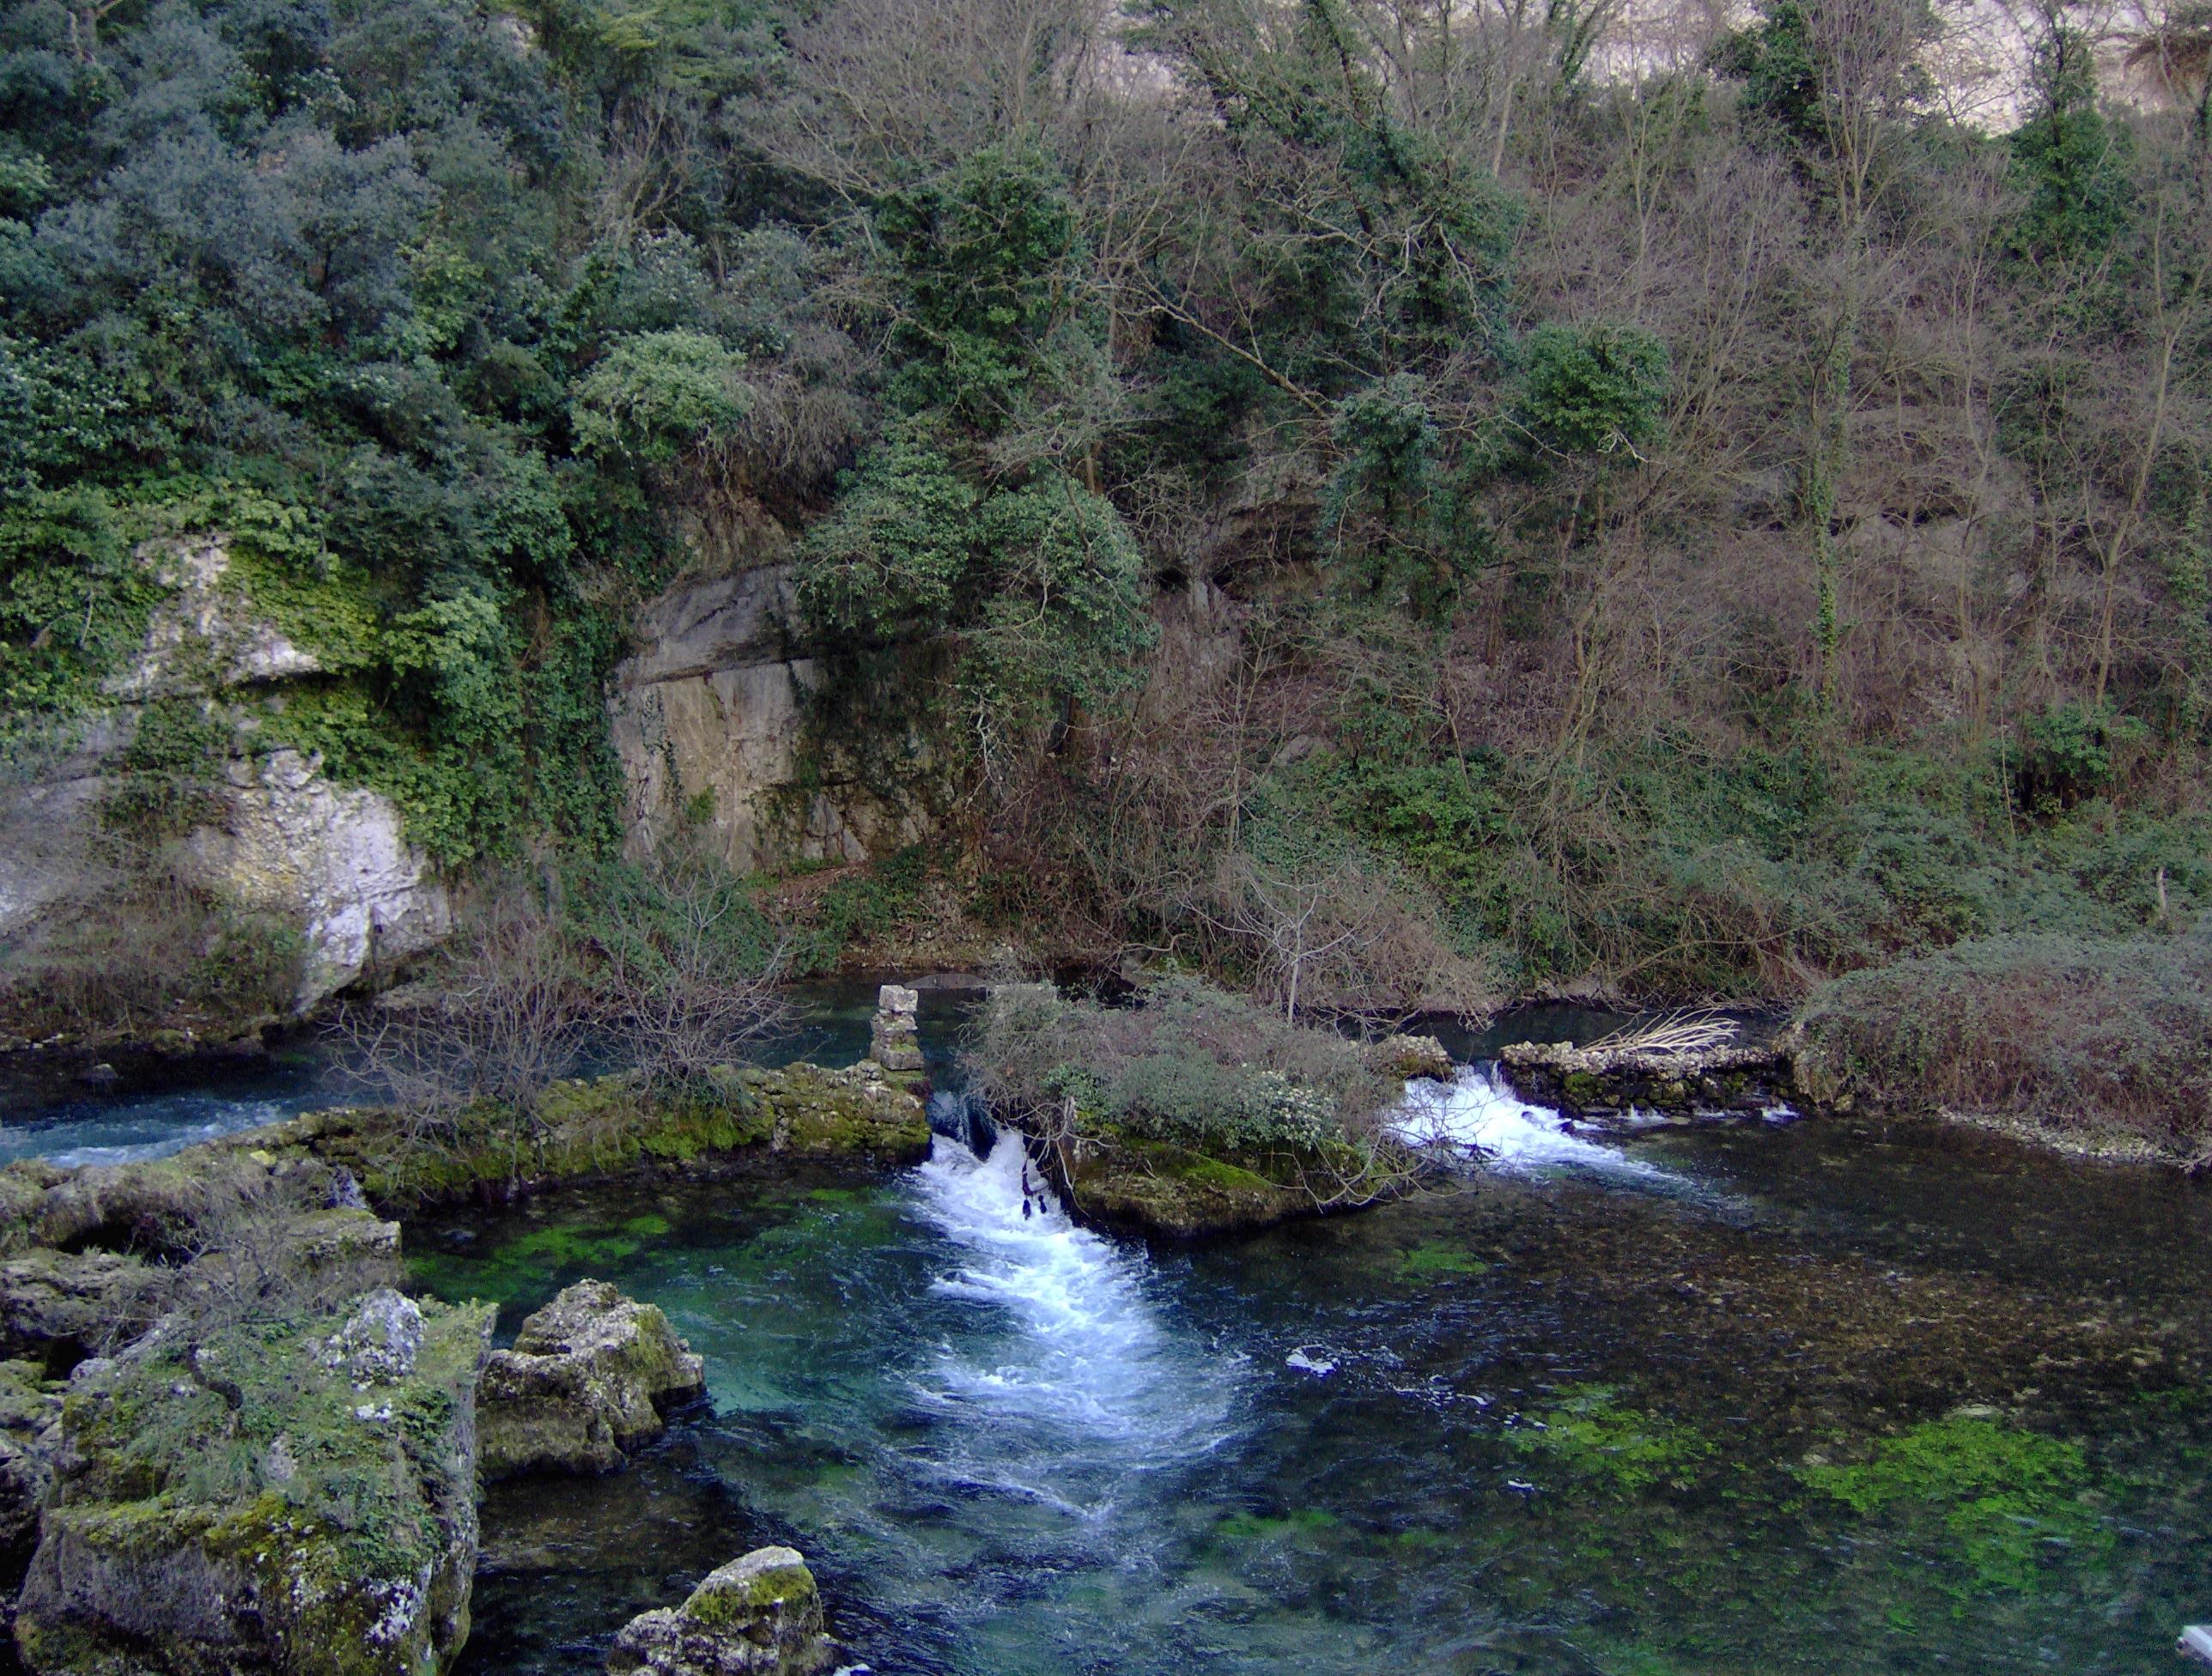 Spring (Hydrology): WikiPedia